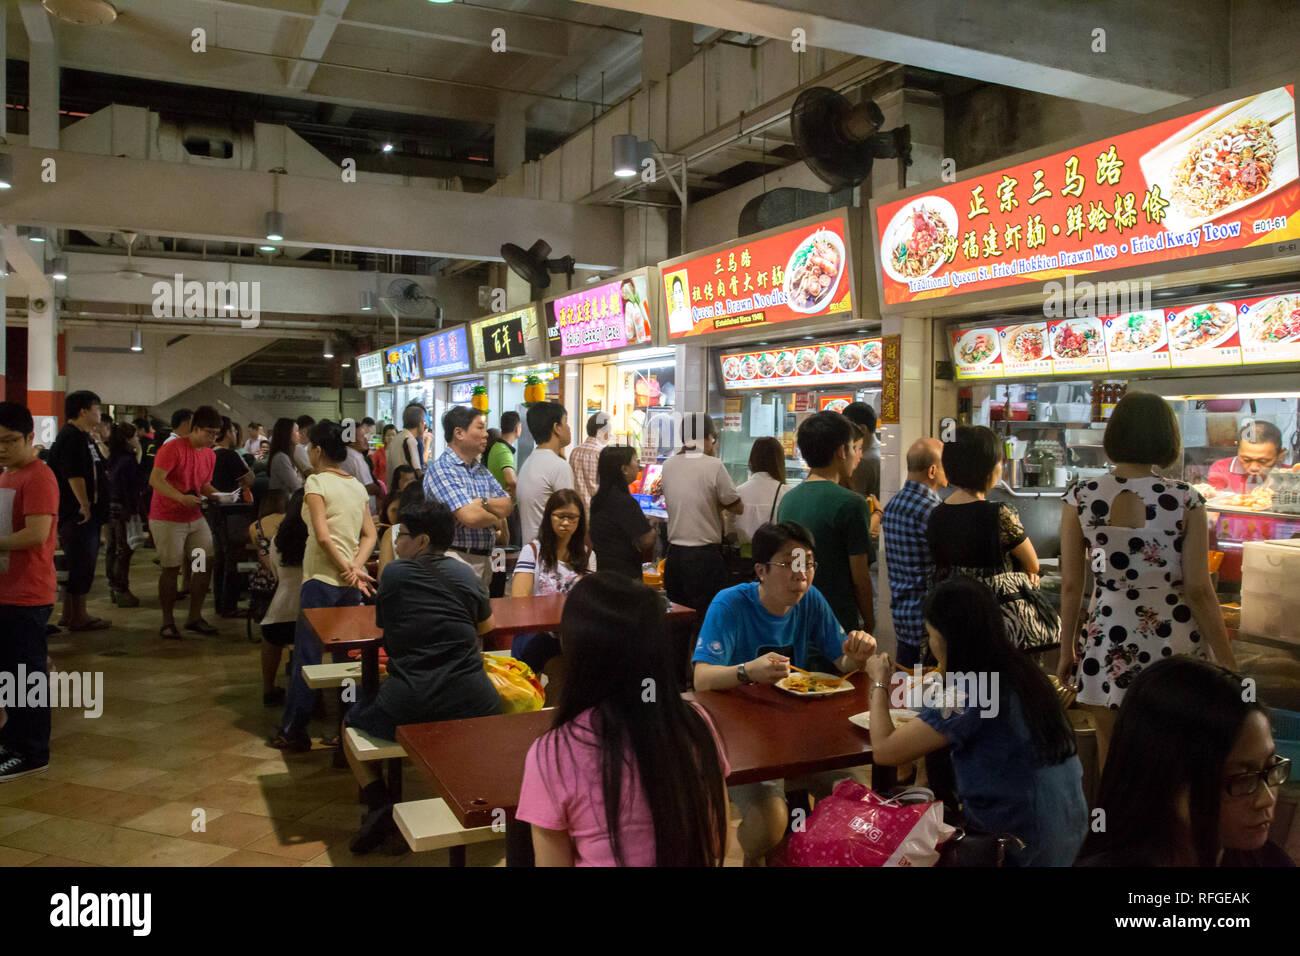 Lau Pa Sat Foodcourt in Singapore - Stock Image